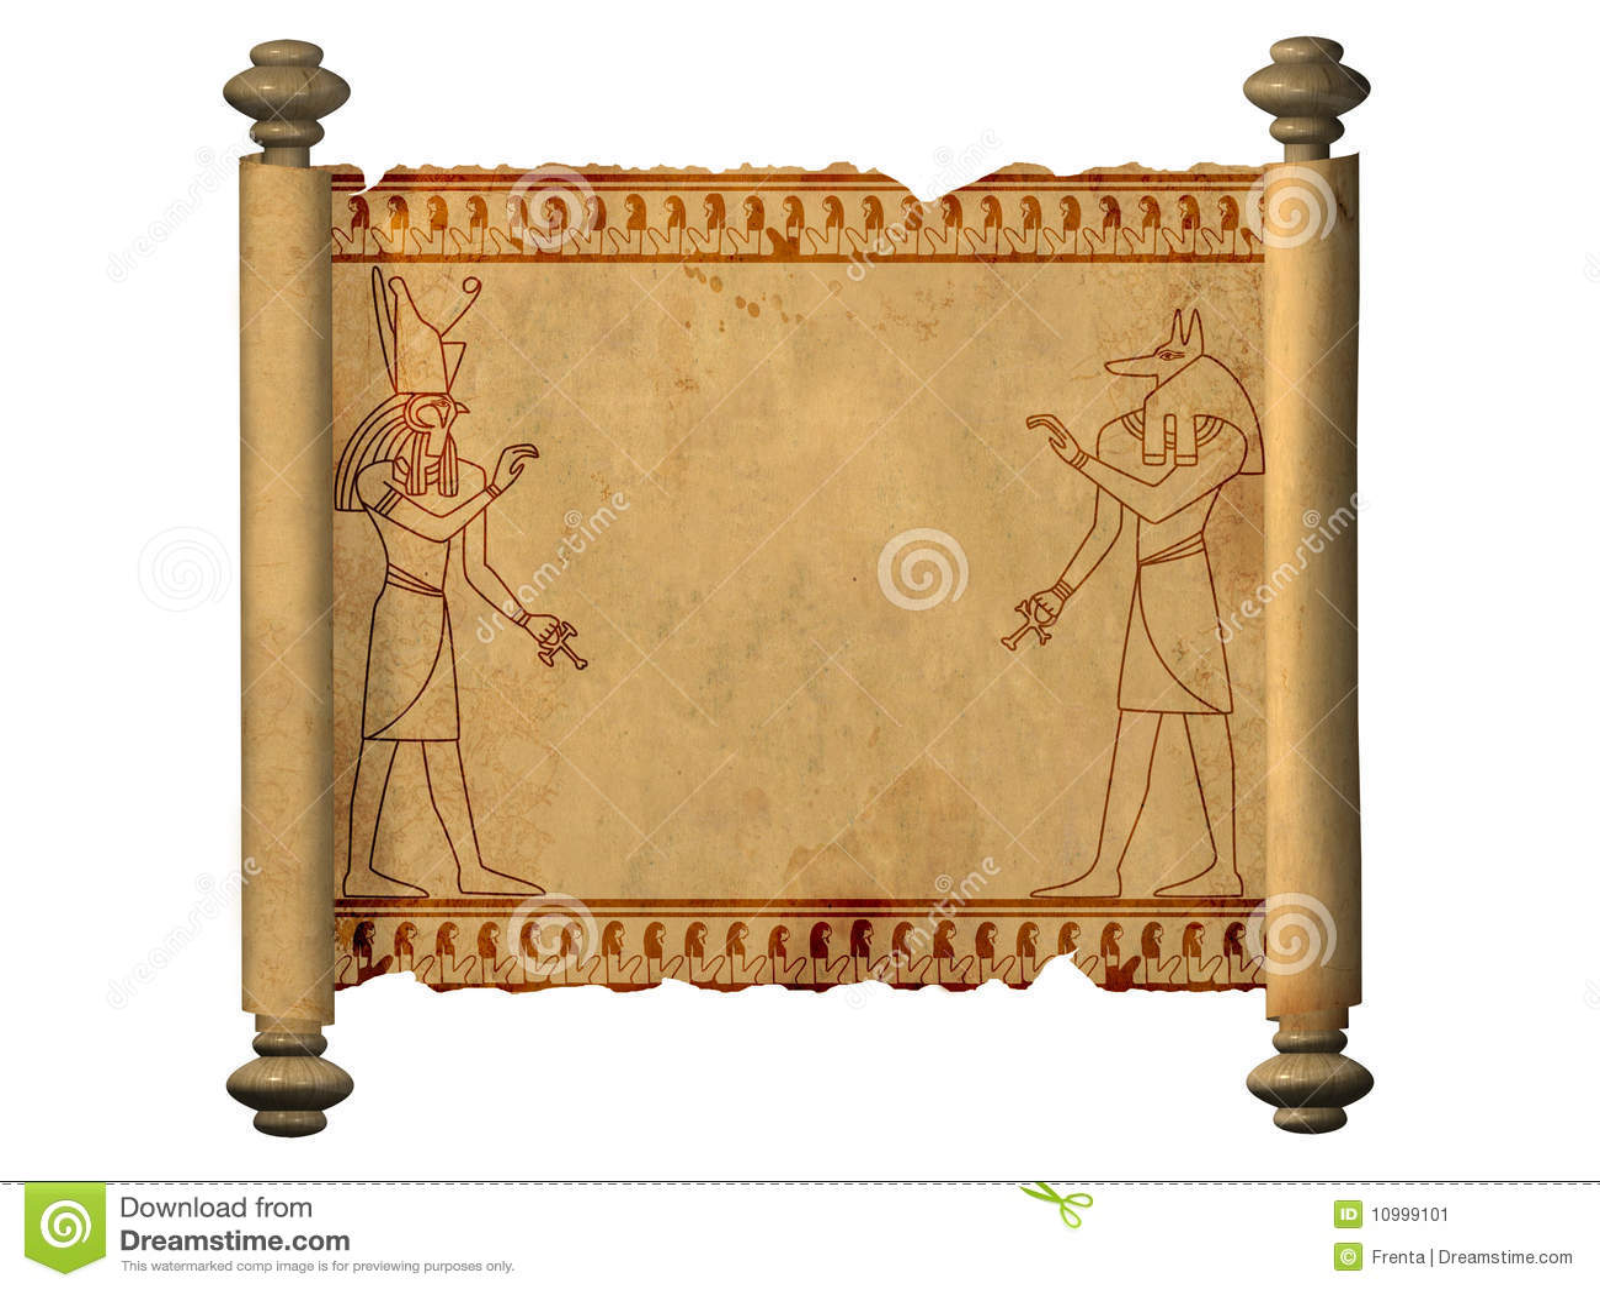 Anubis horus